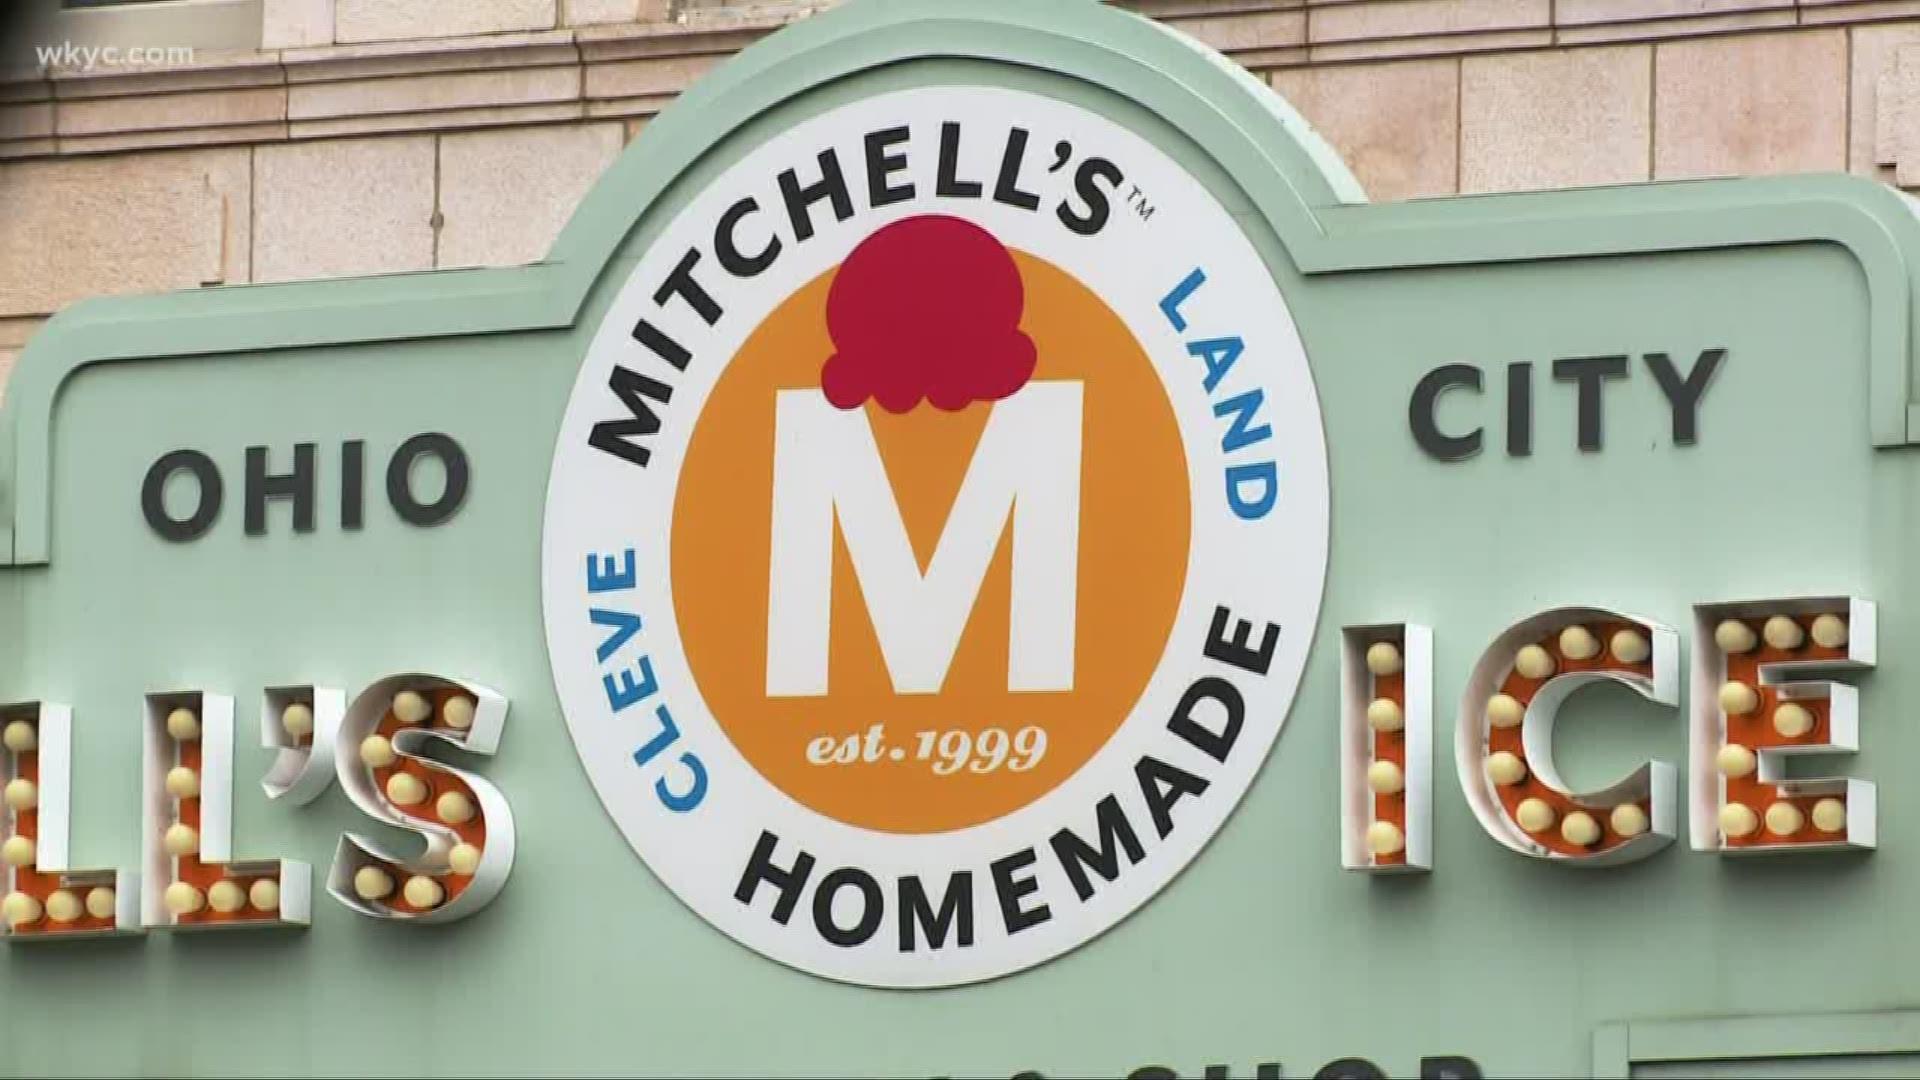 Mitchell S Homemade Ice Cream Celebrates 20 Years In Business 10tv Com